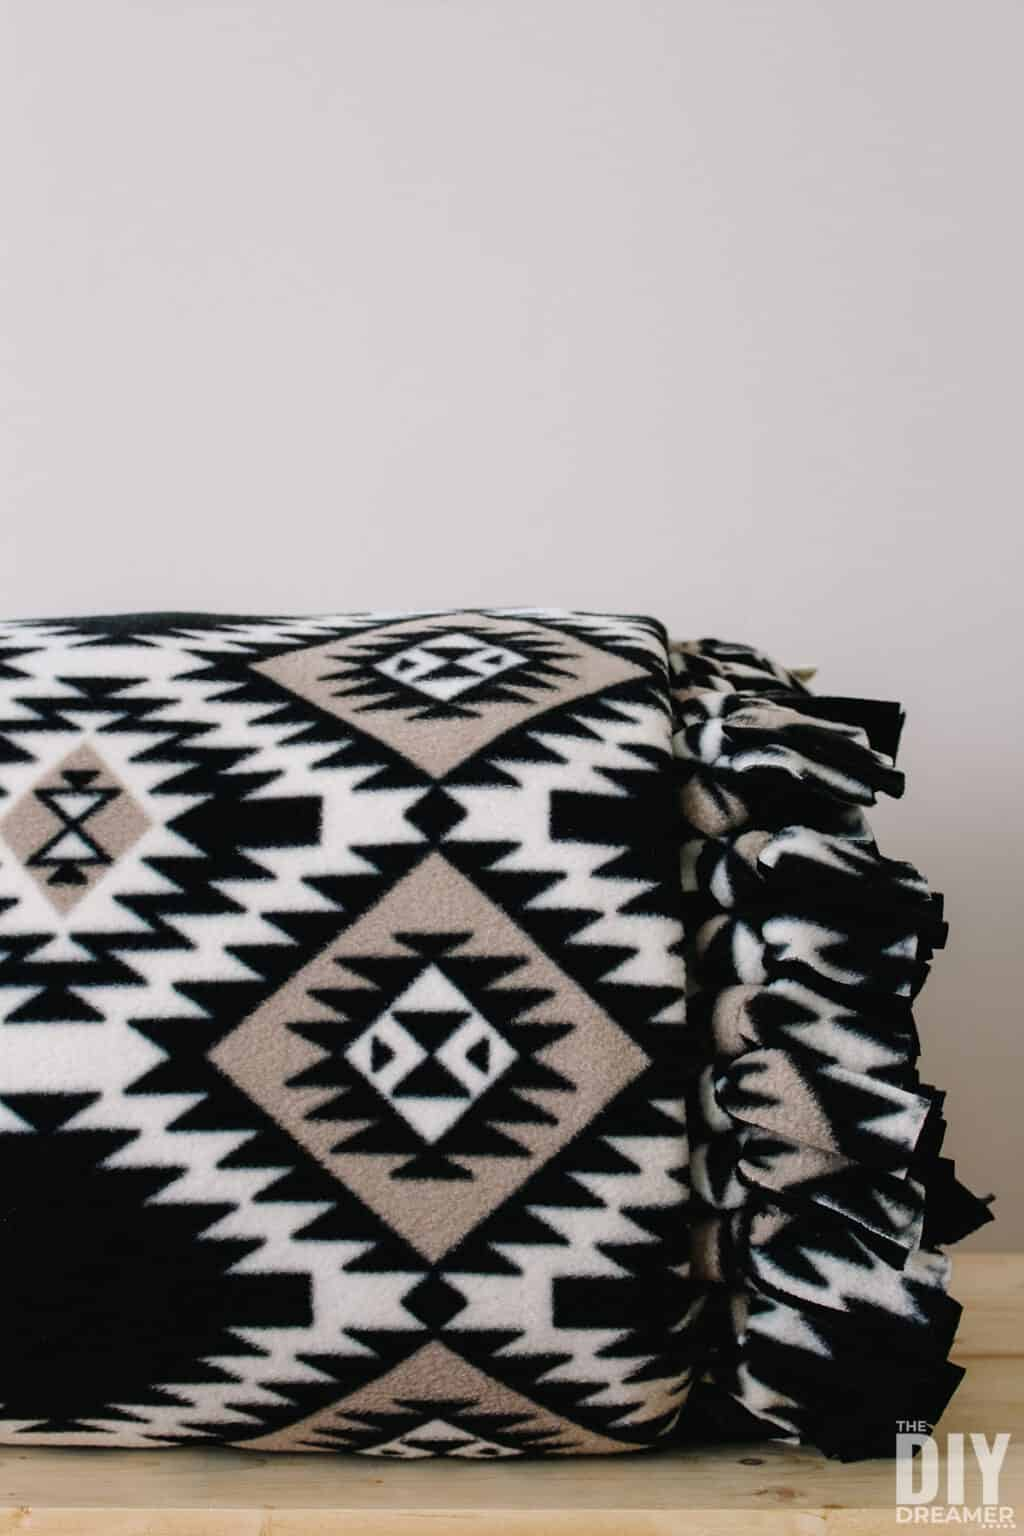 tuesday turn about 91 fleece blanket in geometric print